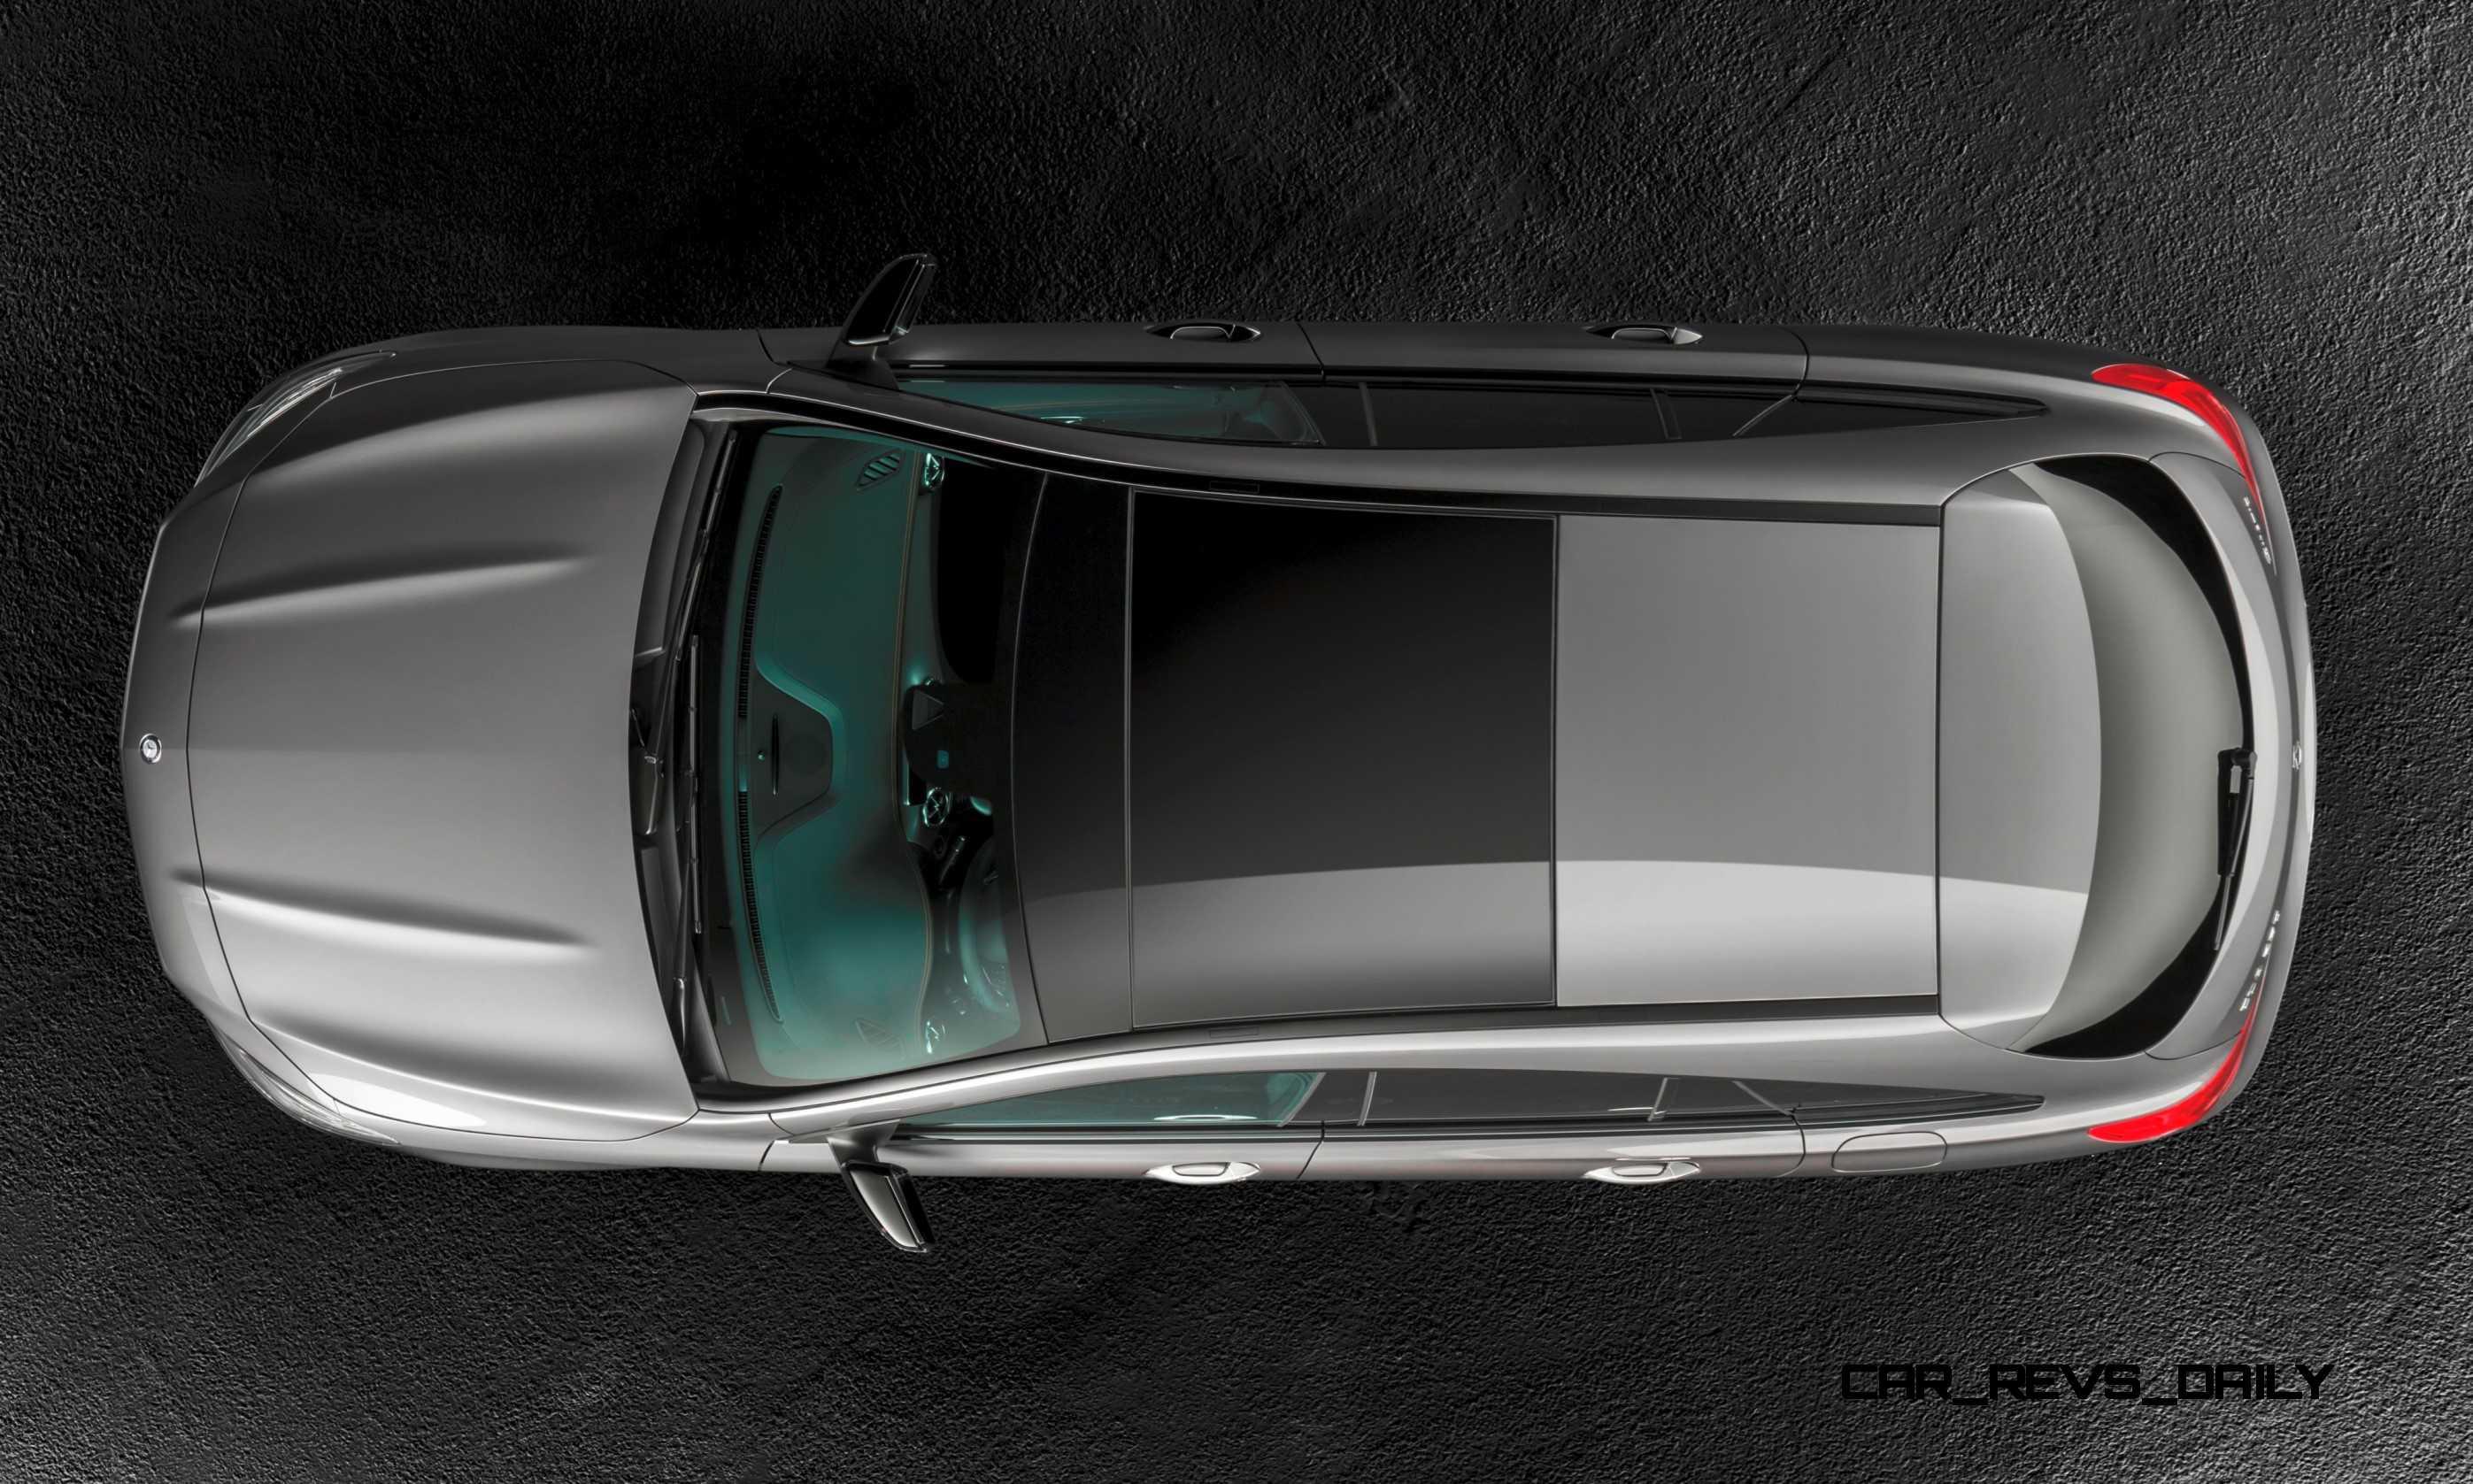 2016 Mercedes Benz Cla250 Shooting Brake Revealed For Euro